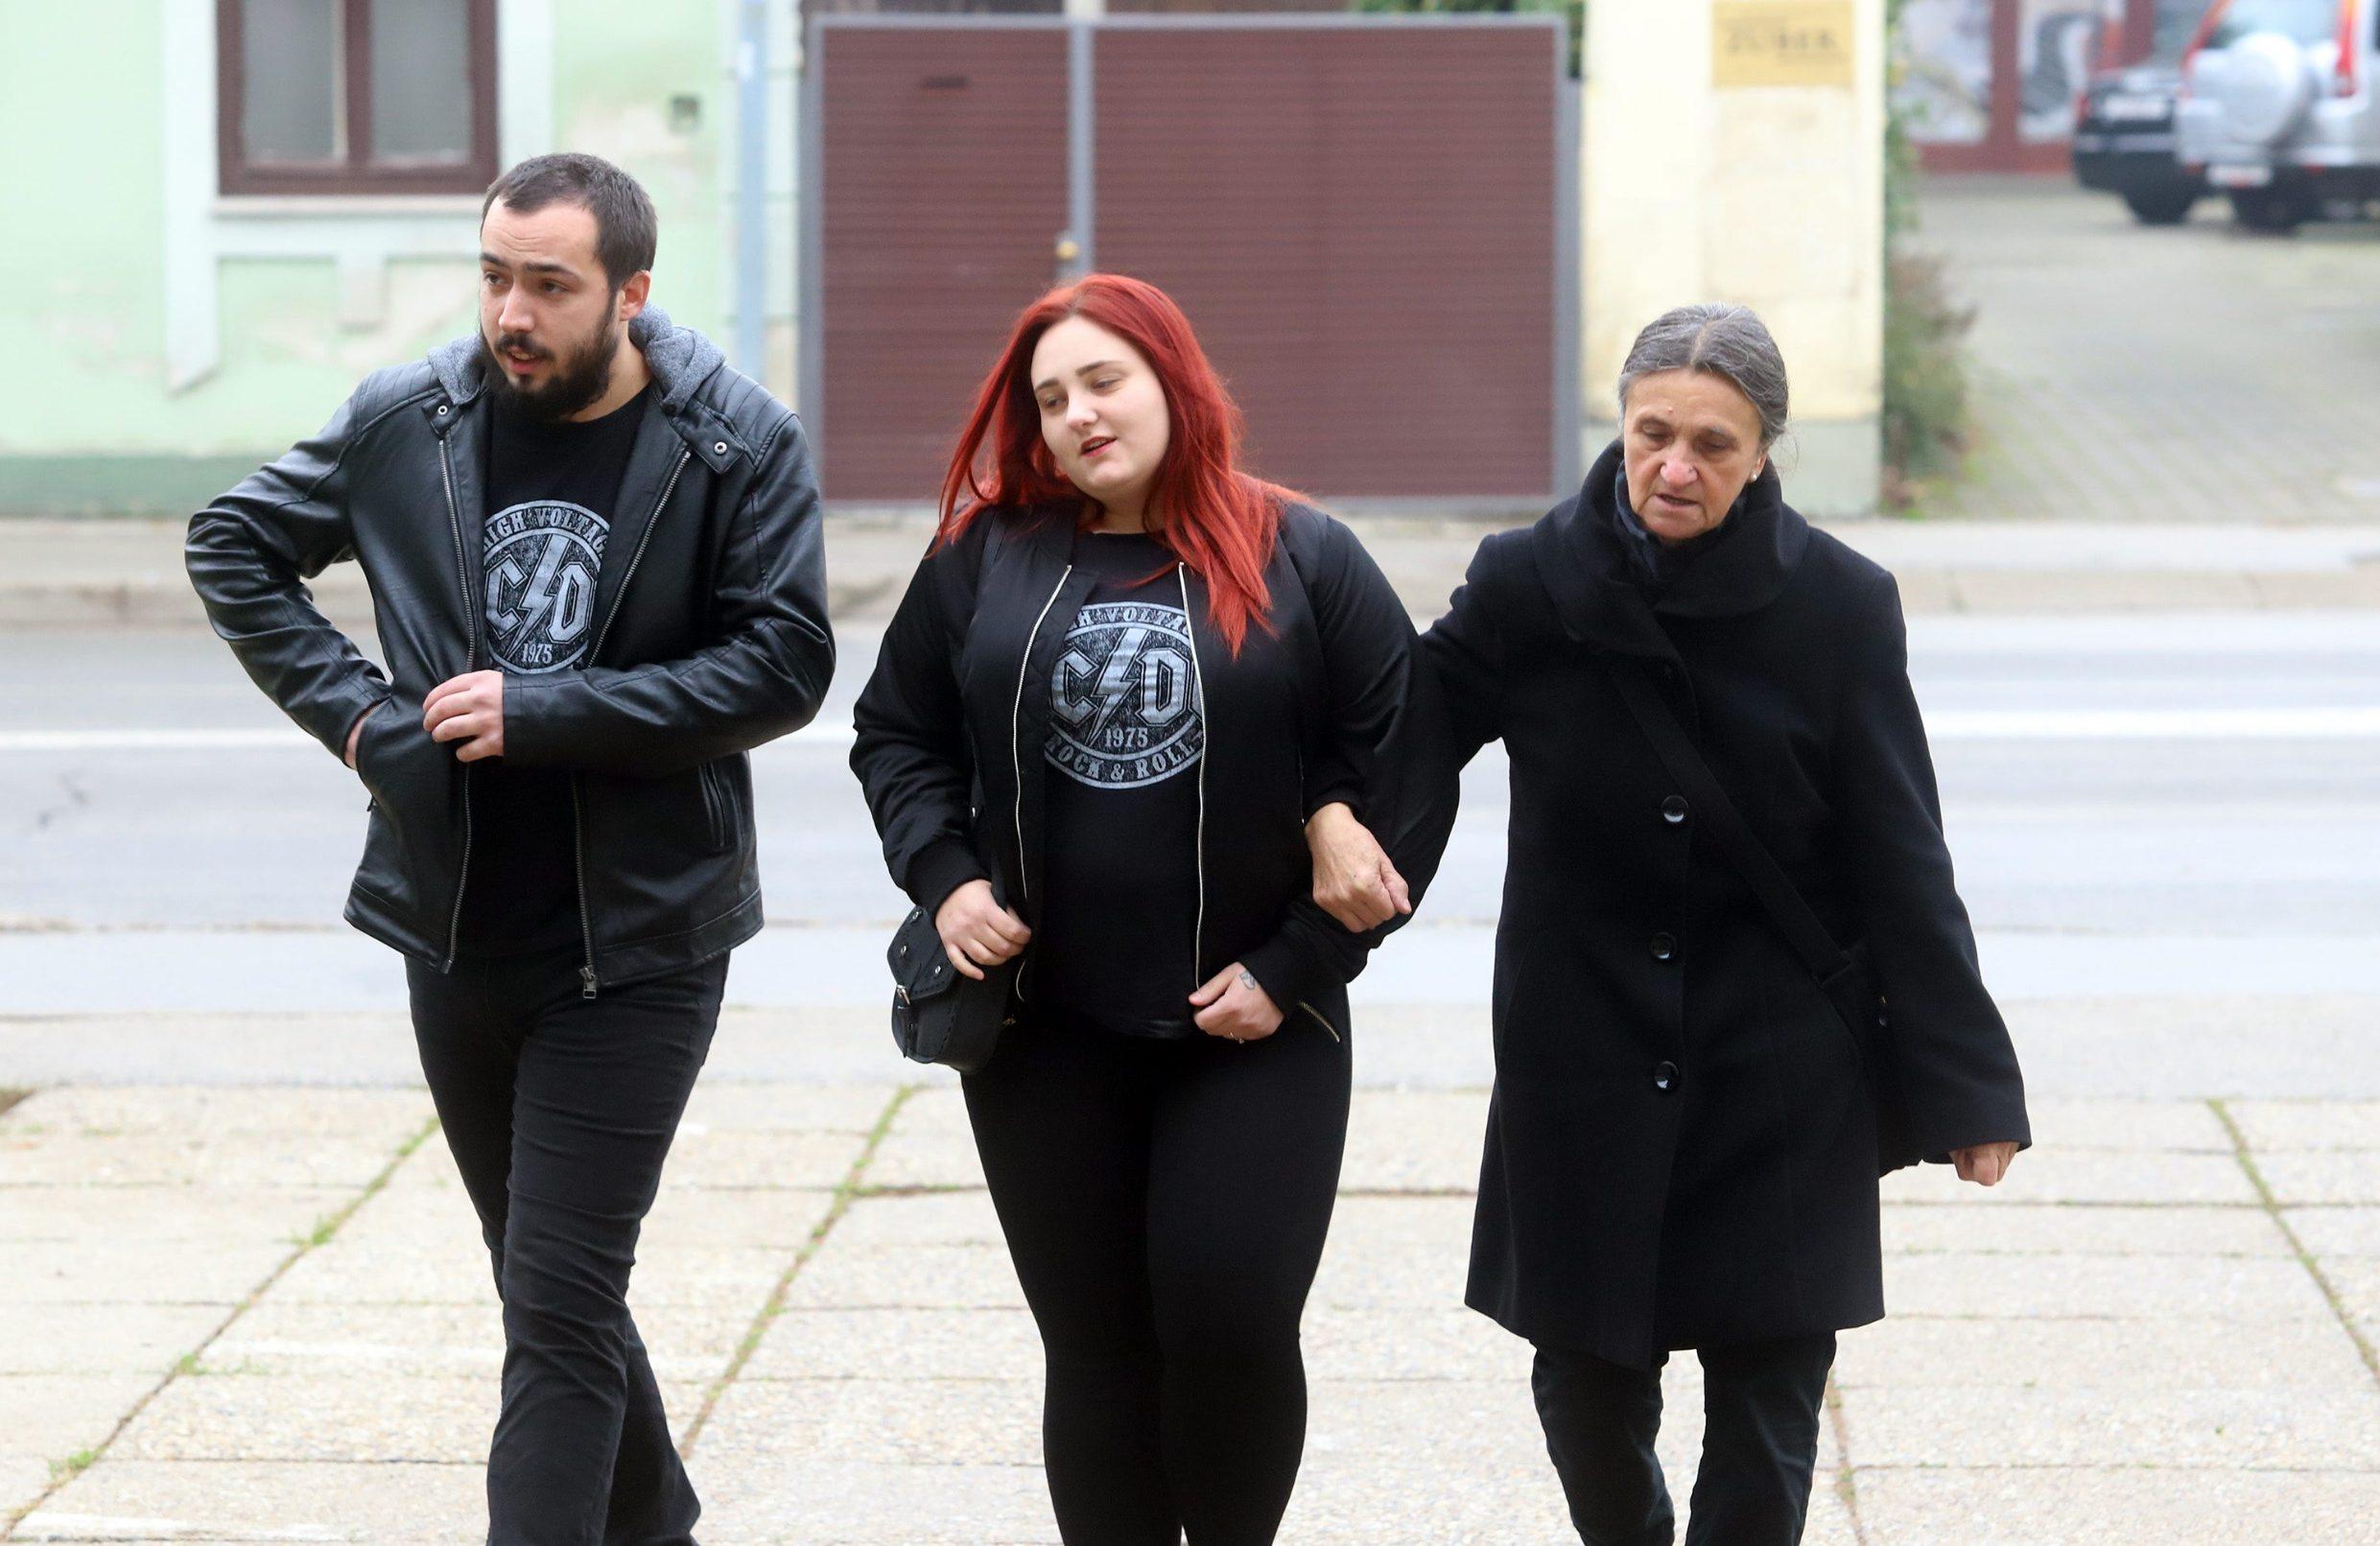 Varazdin, 261119. Na Zupanijskom sudu u Varazdinu nastavljeno je sudjenje Smiljani Srnec za ubojstvo sestre Jasmine Dominic. Na fotografiji: Obitelj Smiljane Srnce, kcer, zet i majka. Foto: Zeljko Hajdinjak / CROPIX